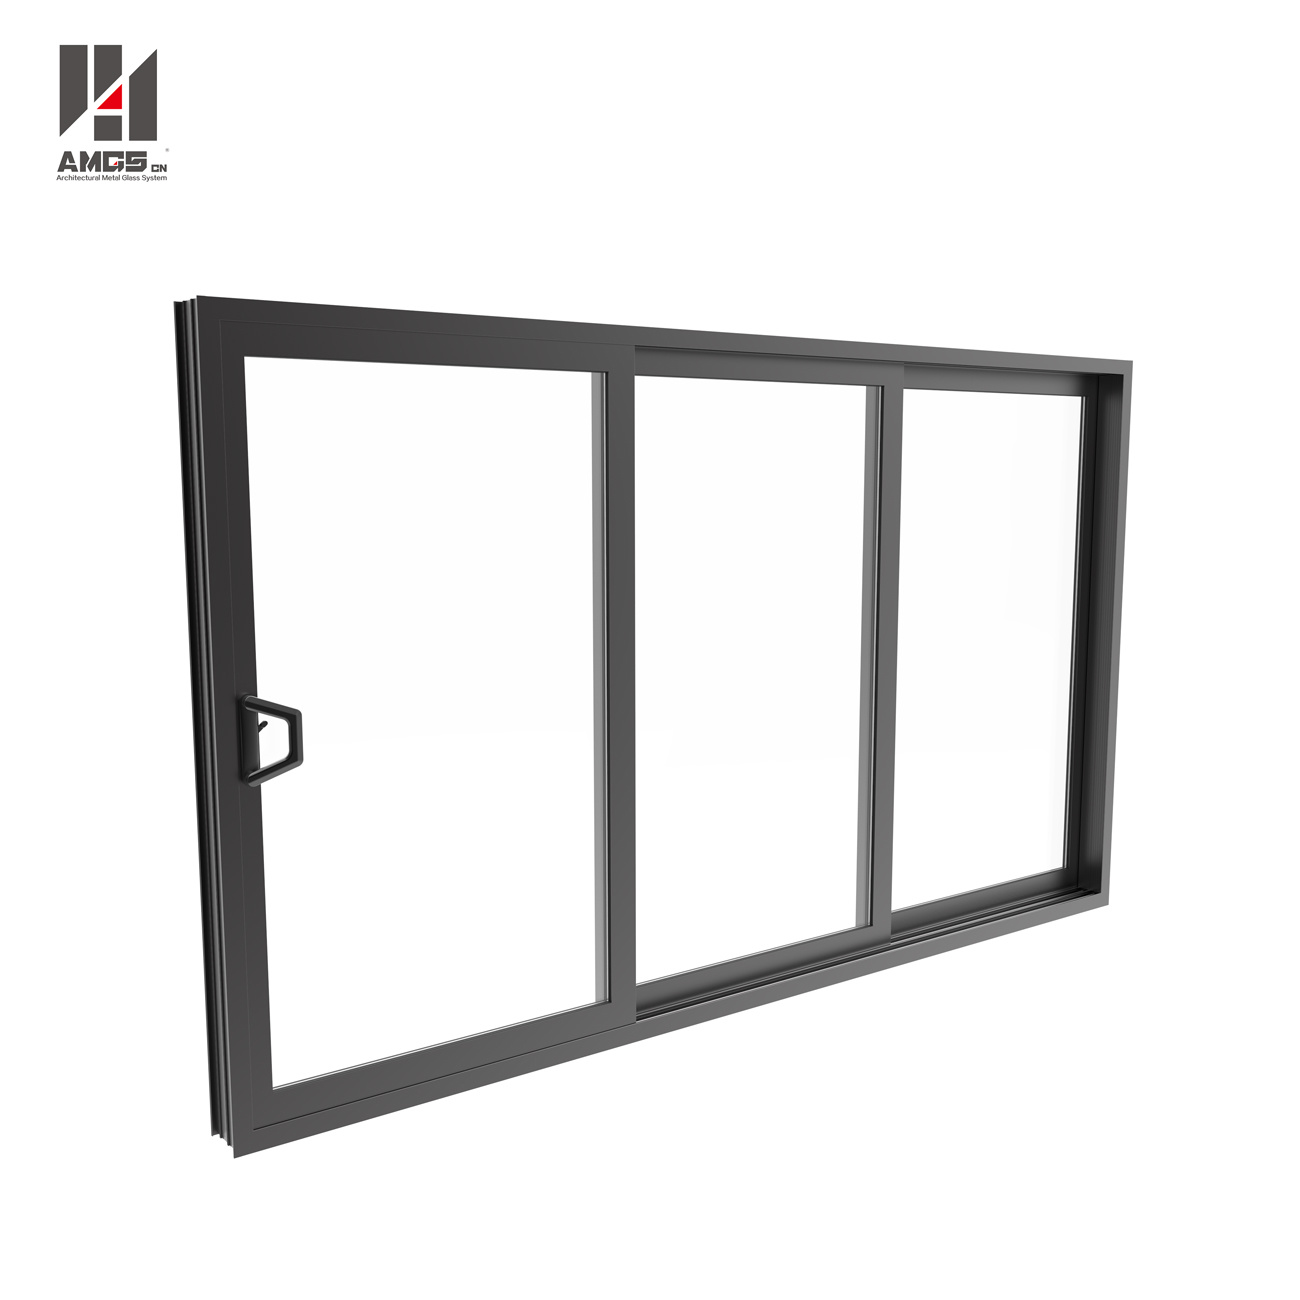 Hot Sale Soundproof Double Glazed Aluminum Sliding Window